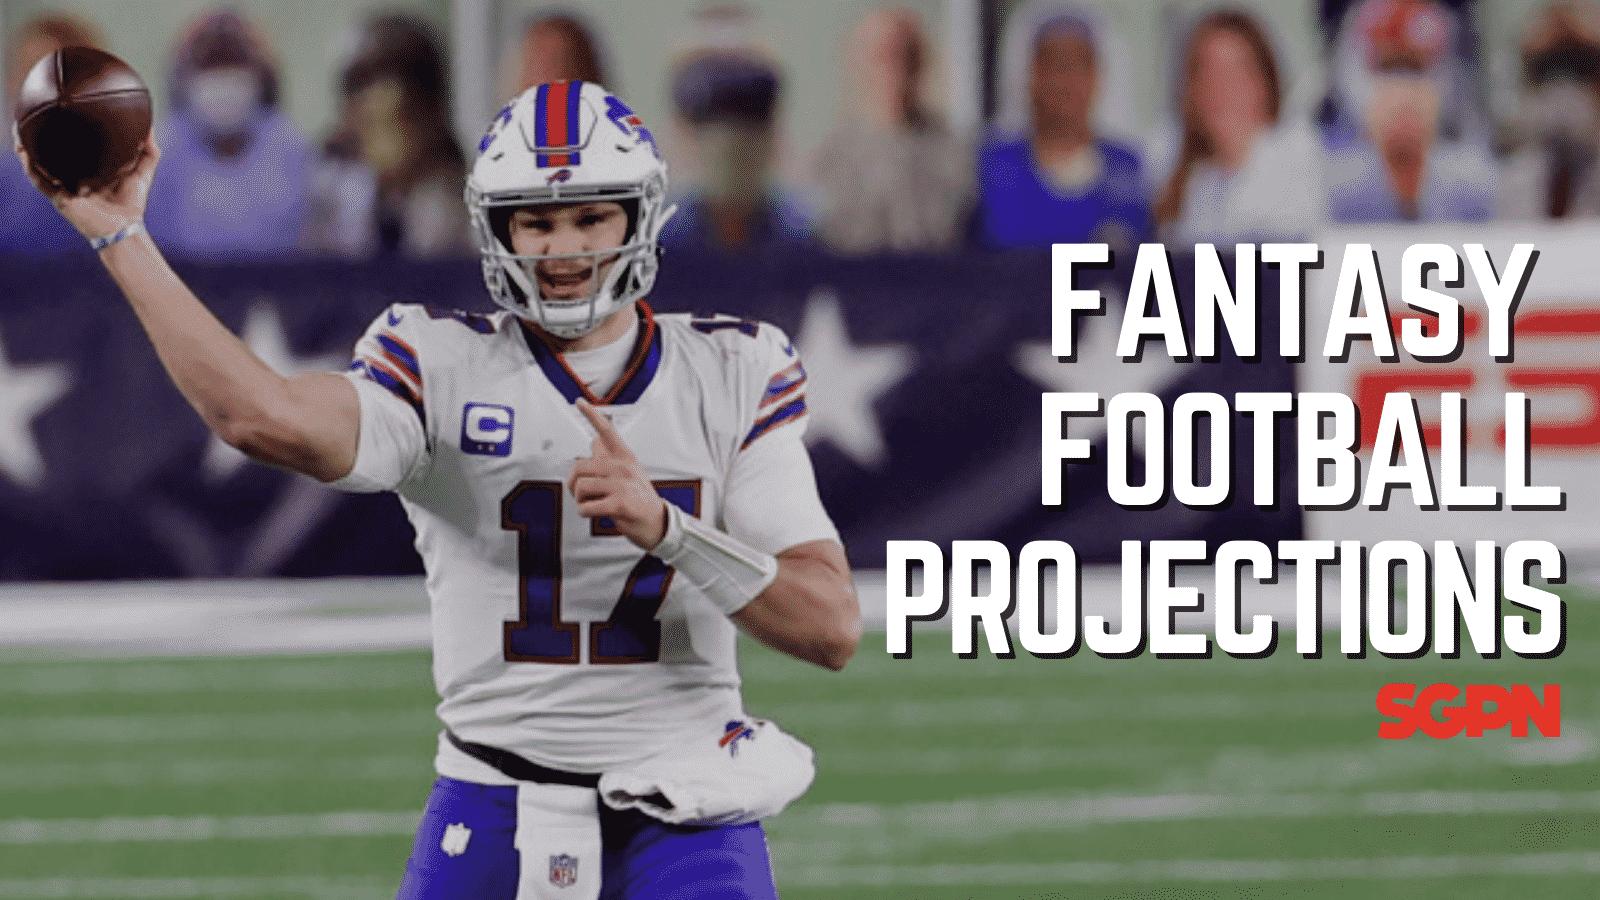 fantasy football projections